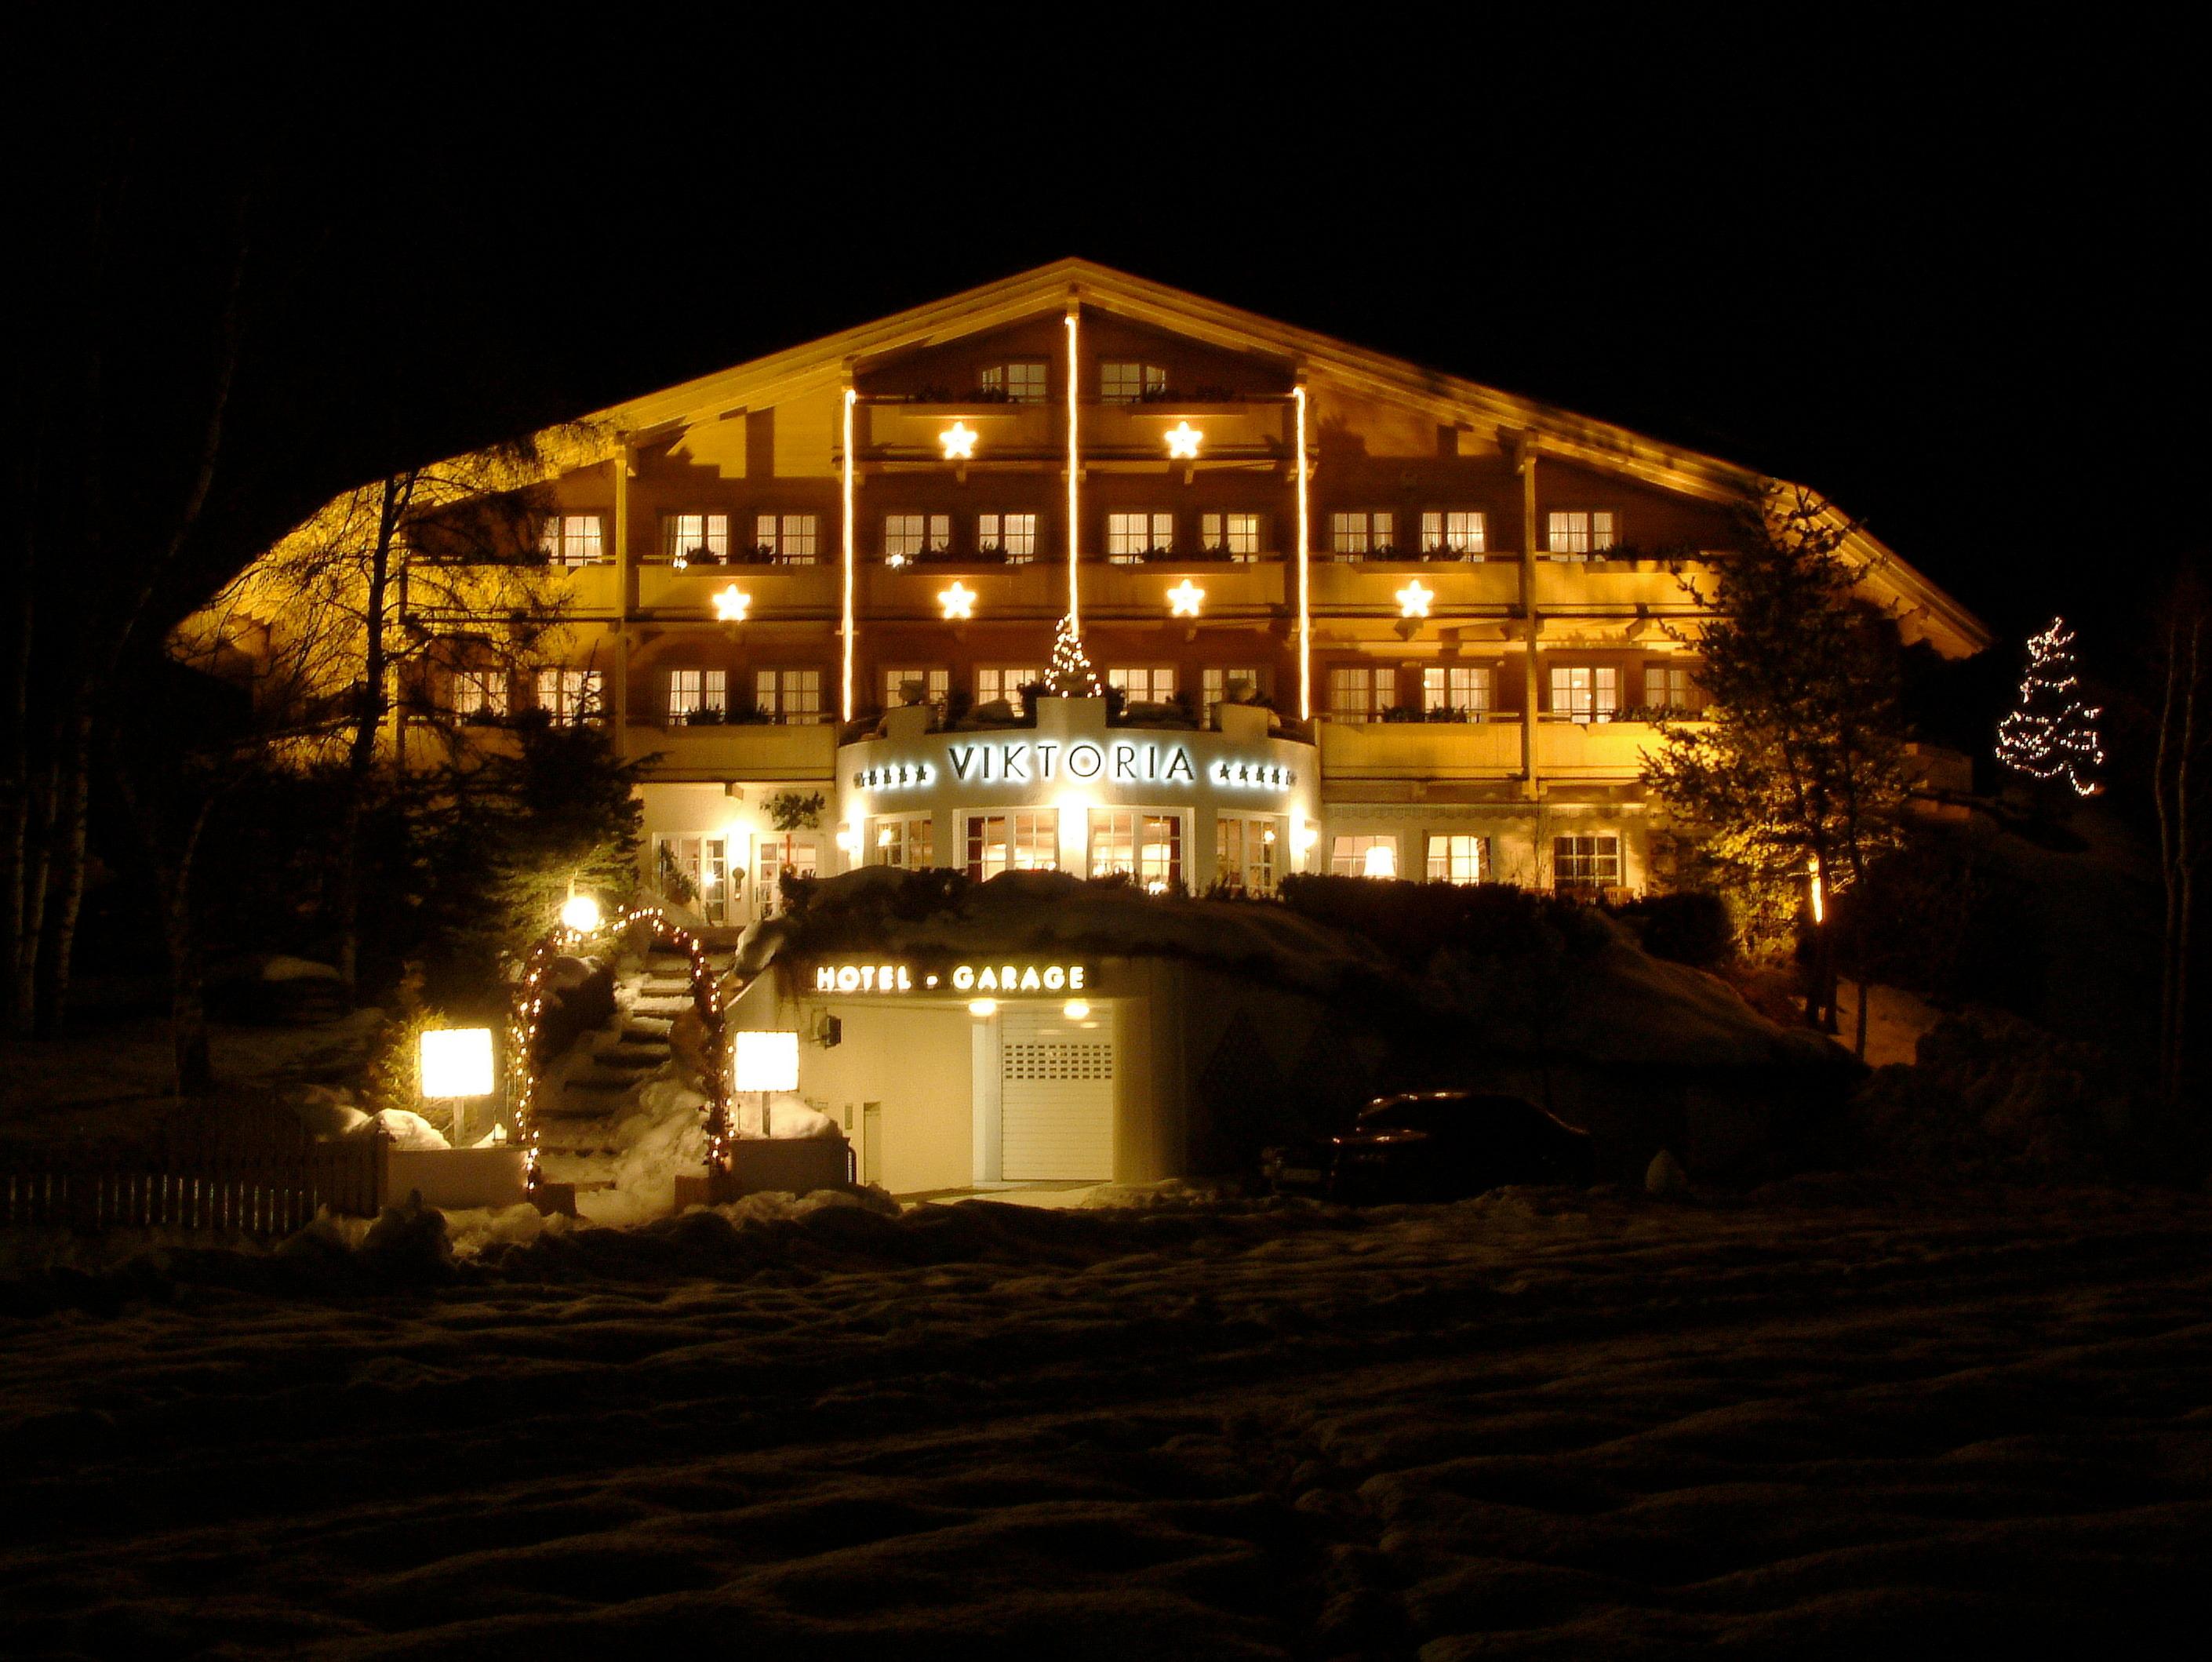 Appartement de vacances A-VITA Viktoria Residenzen Top 4 - KAT. I (2350237), Seefeld in Tirol, Seefeld, Tyrol, Autriche, image 8